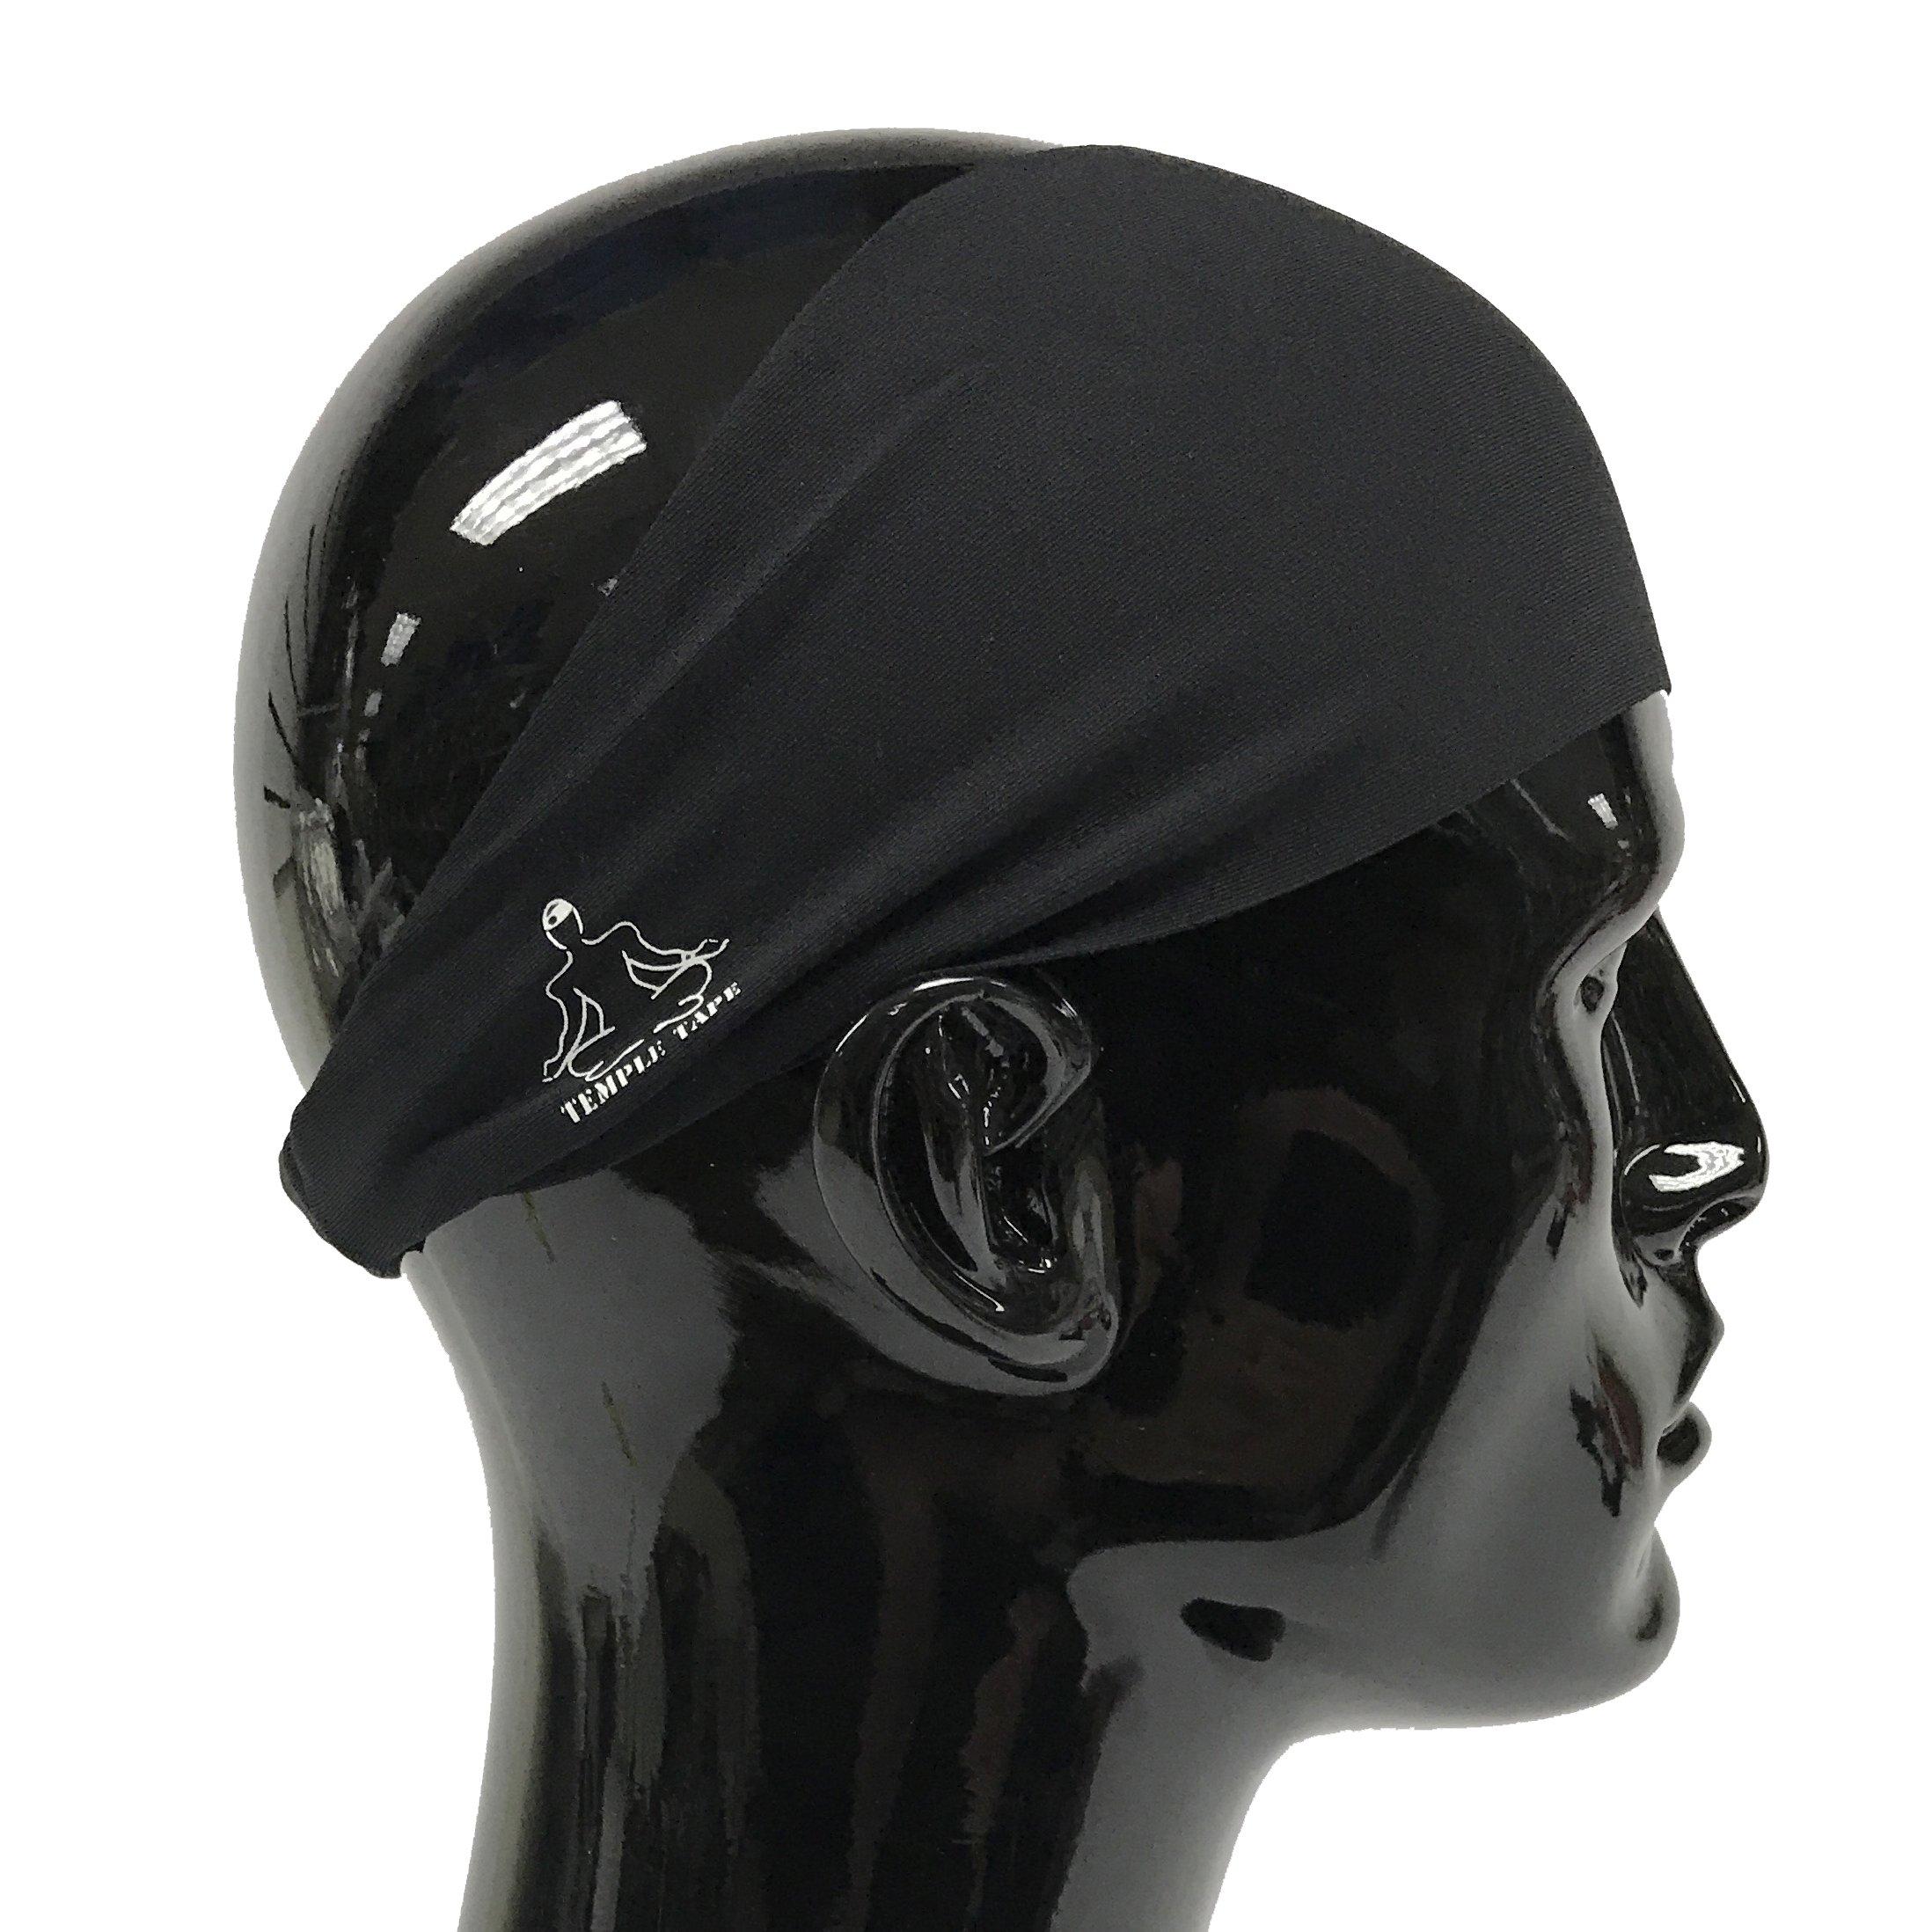 Temple Tape Headbands for Men and Women - Mens Sweatband & Sports Headband Moisture Wicking Workout Sweatbands for Running, Cross Training, Yoga and Bike Helmet Friendly - Black